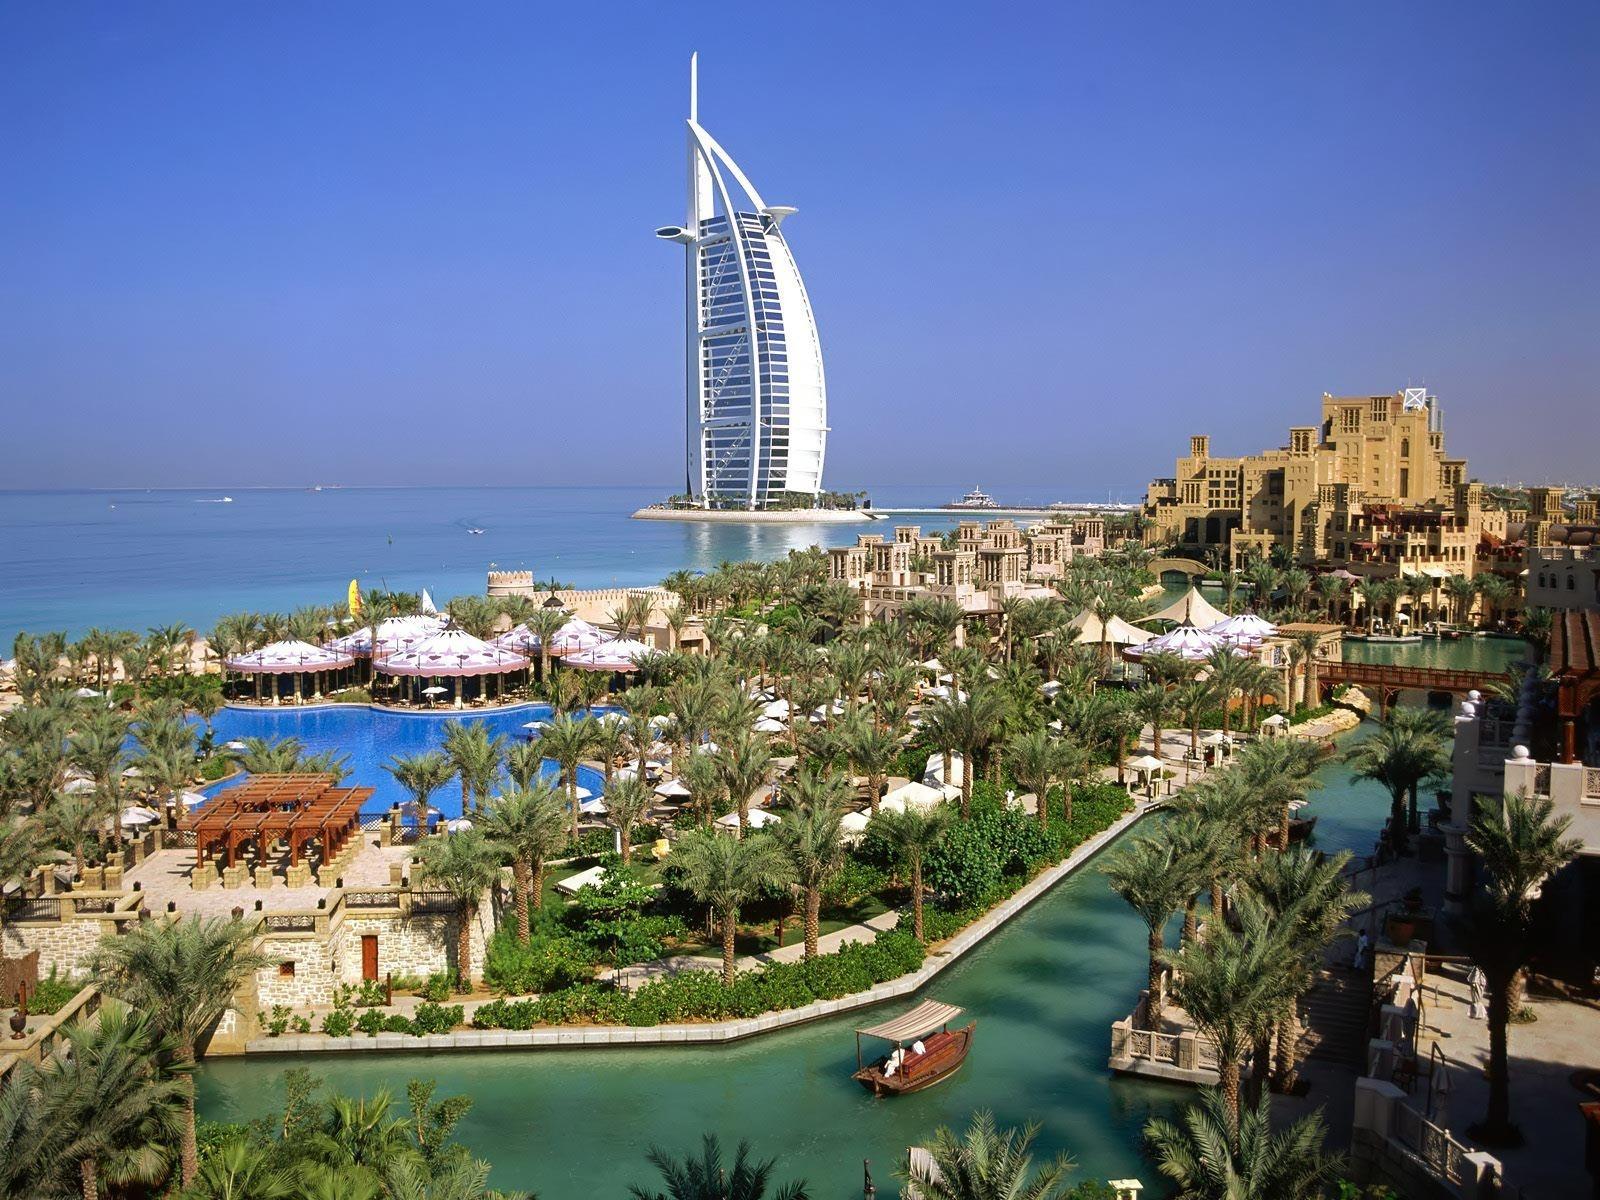 http://4.bp.blogspot.com/-5O0Y0blLBdI/Ty-h_XRw4wI/AAAAAAAAAh0/EgYXfy_zcyo/s1600/Burj_Al_Arab_Hotel_Dubai_Saudi_Arabia_HD_Wallpaper-Vvallpaper.Net.jpg